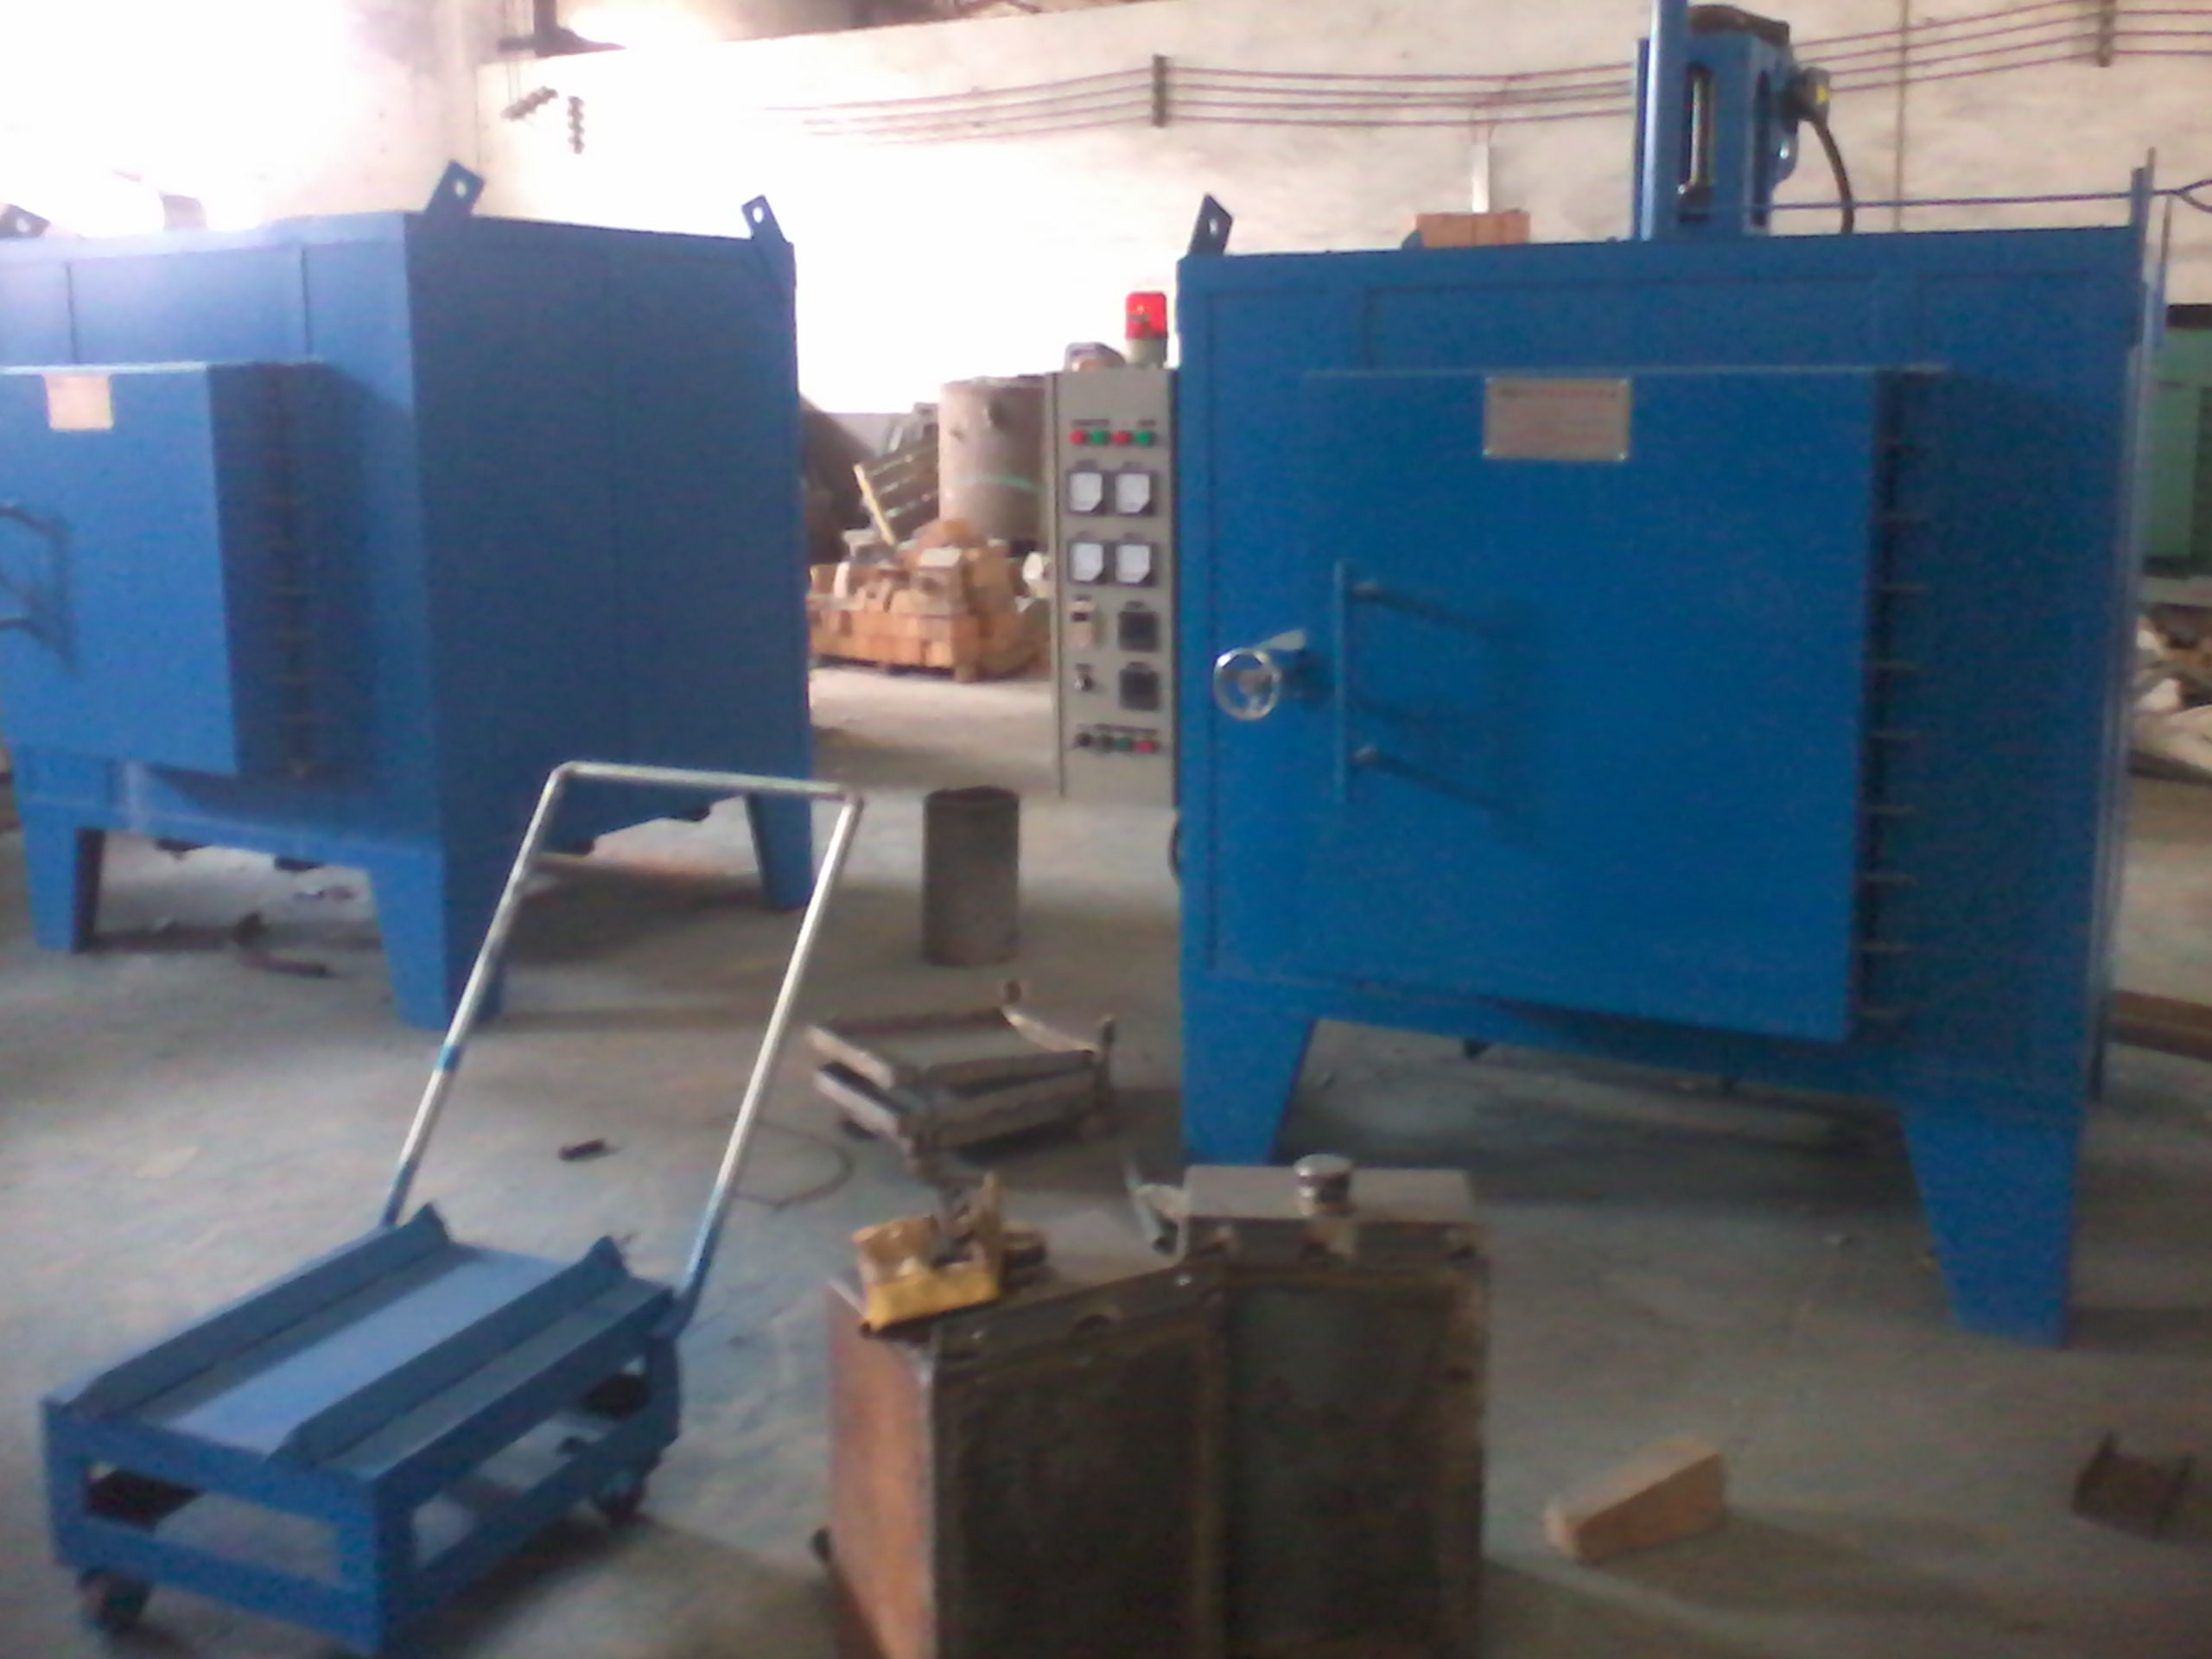 rx3-45-9箱式电阻炉 广东省东莞市万江金力泰五金电炉厂生产